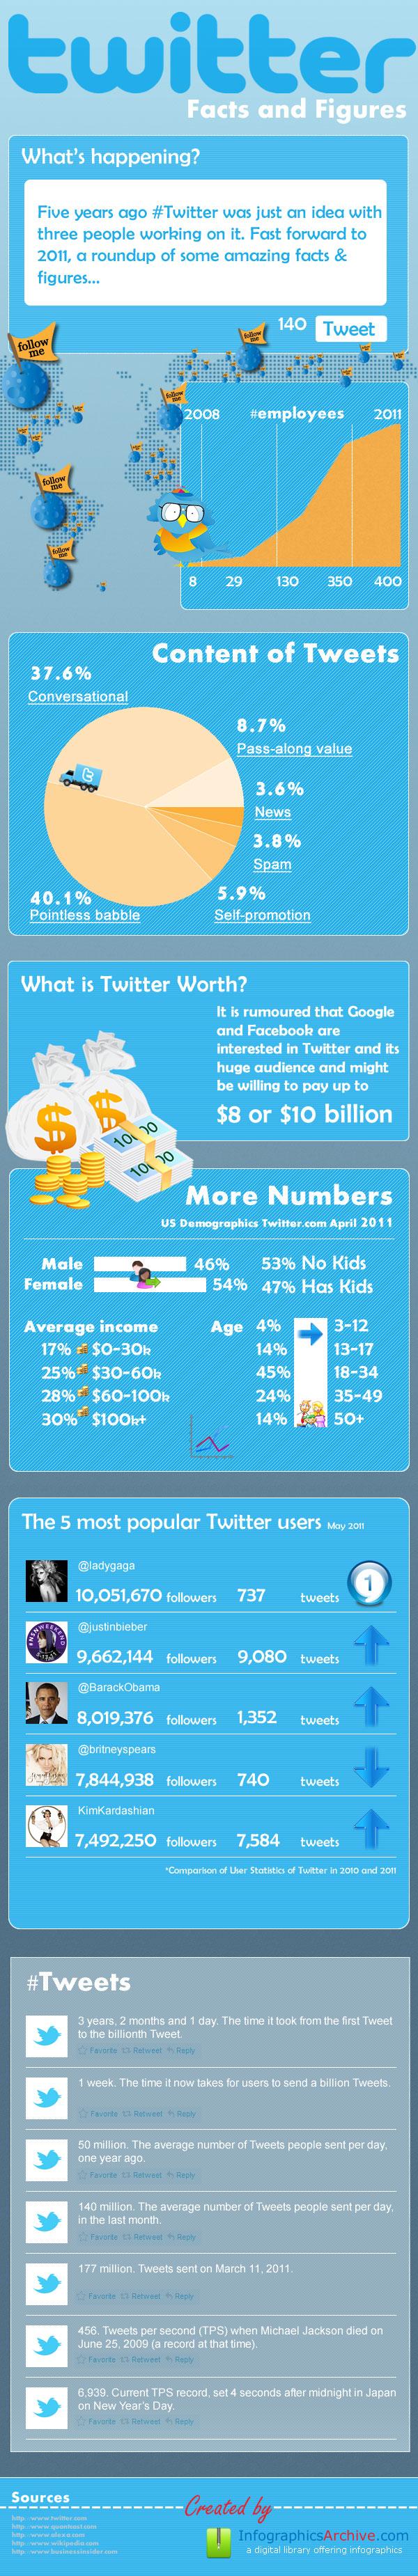 infographic-on-social-media-16